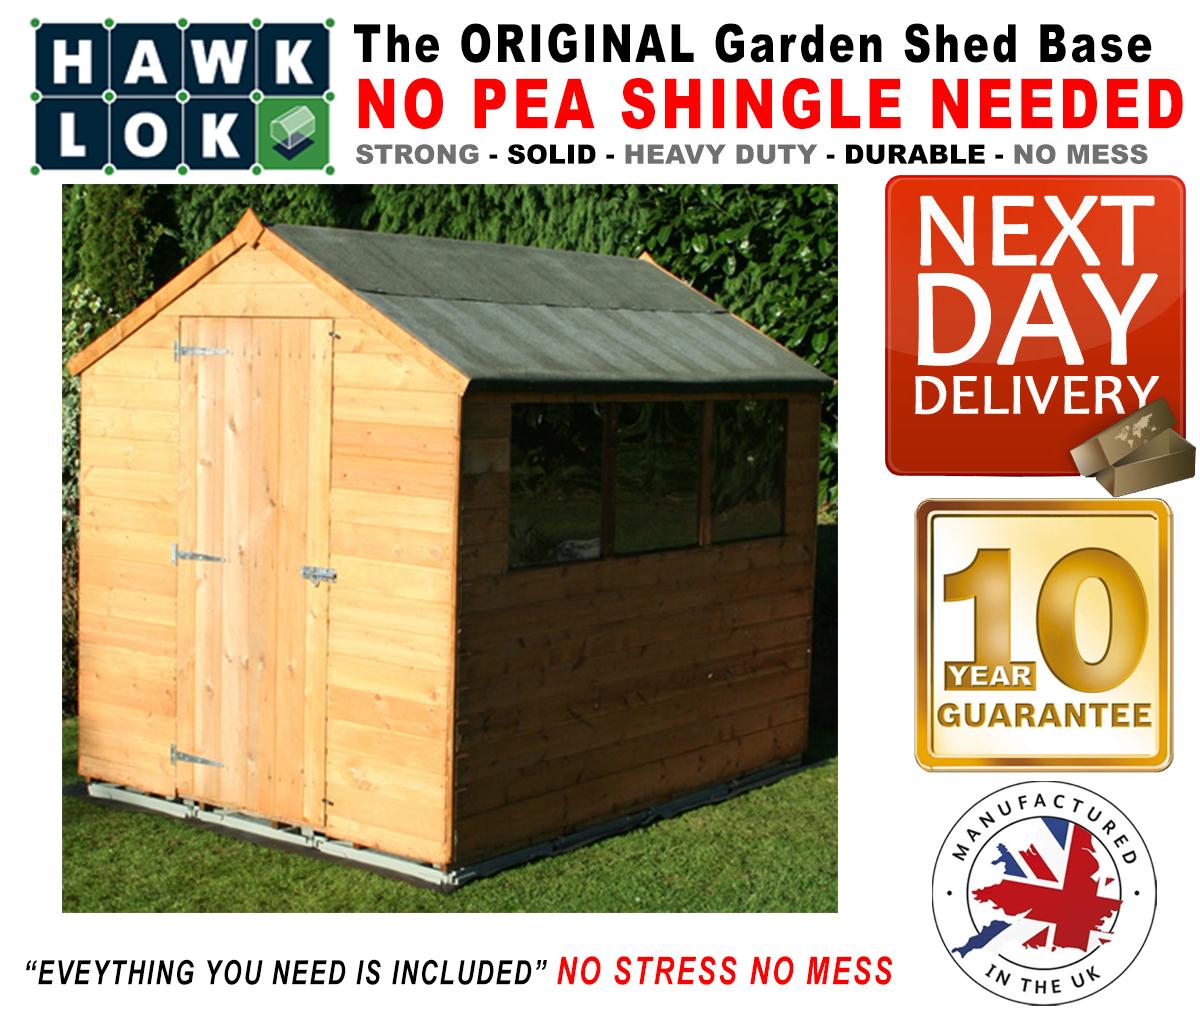 Hawklok shed base kit for garden shed building all sizes for Garden shed sizes